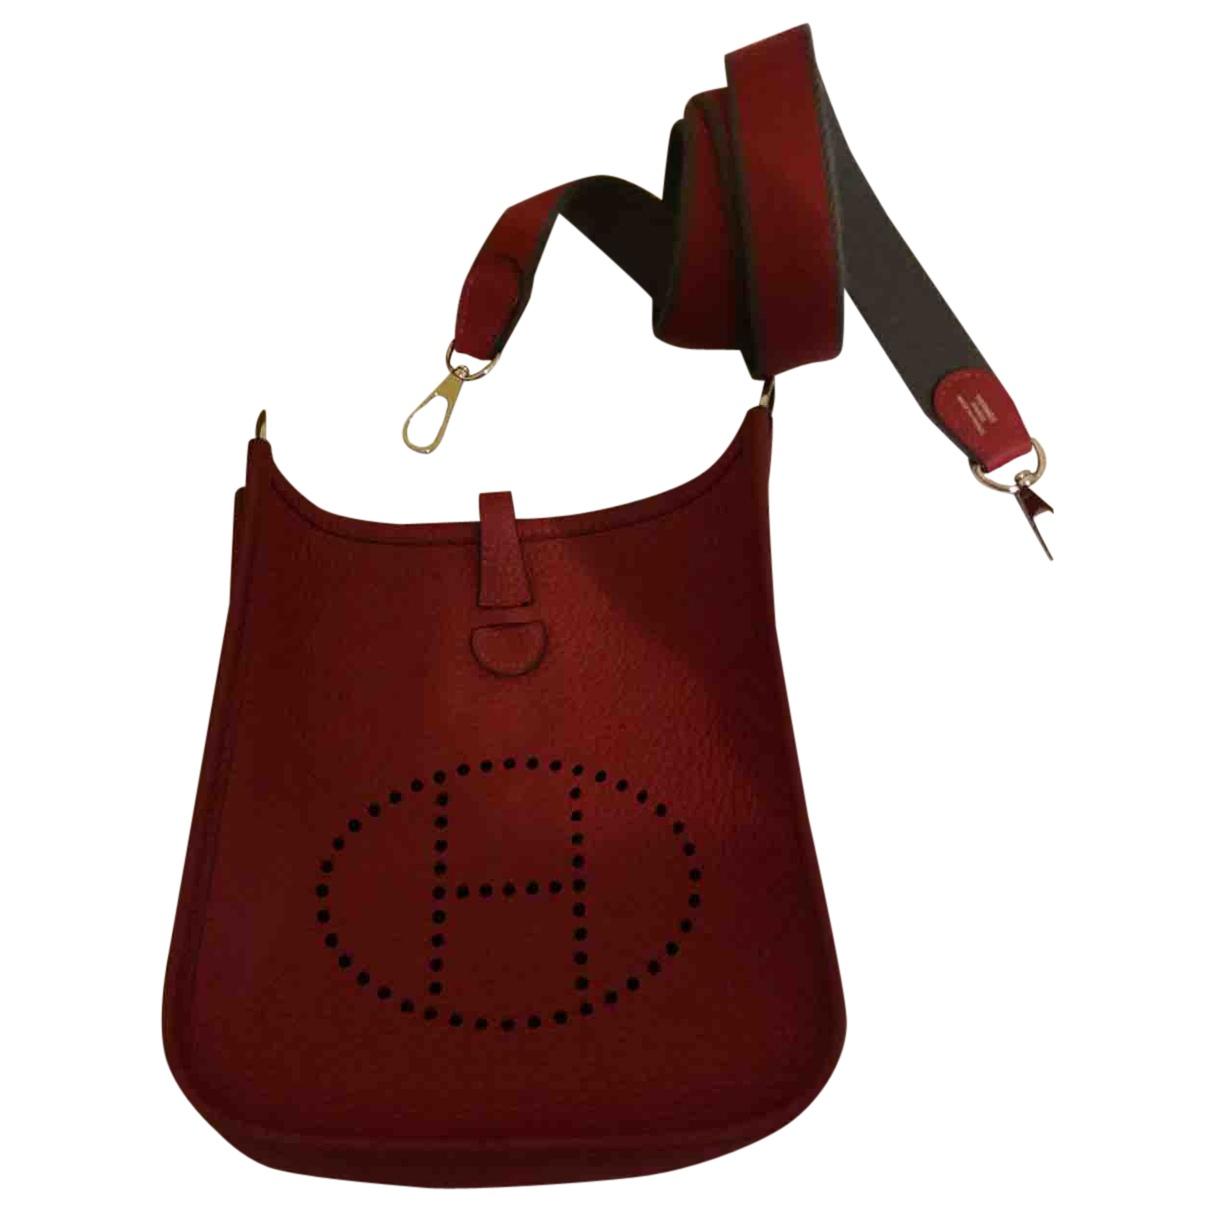 Hermes Evelyne Handtasche in  Rot Leder